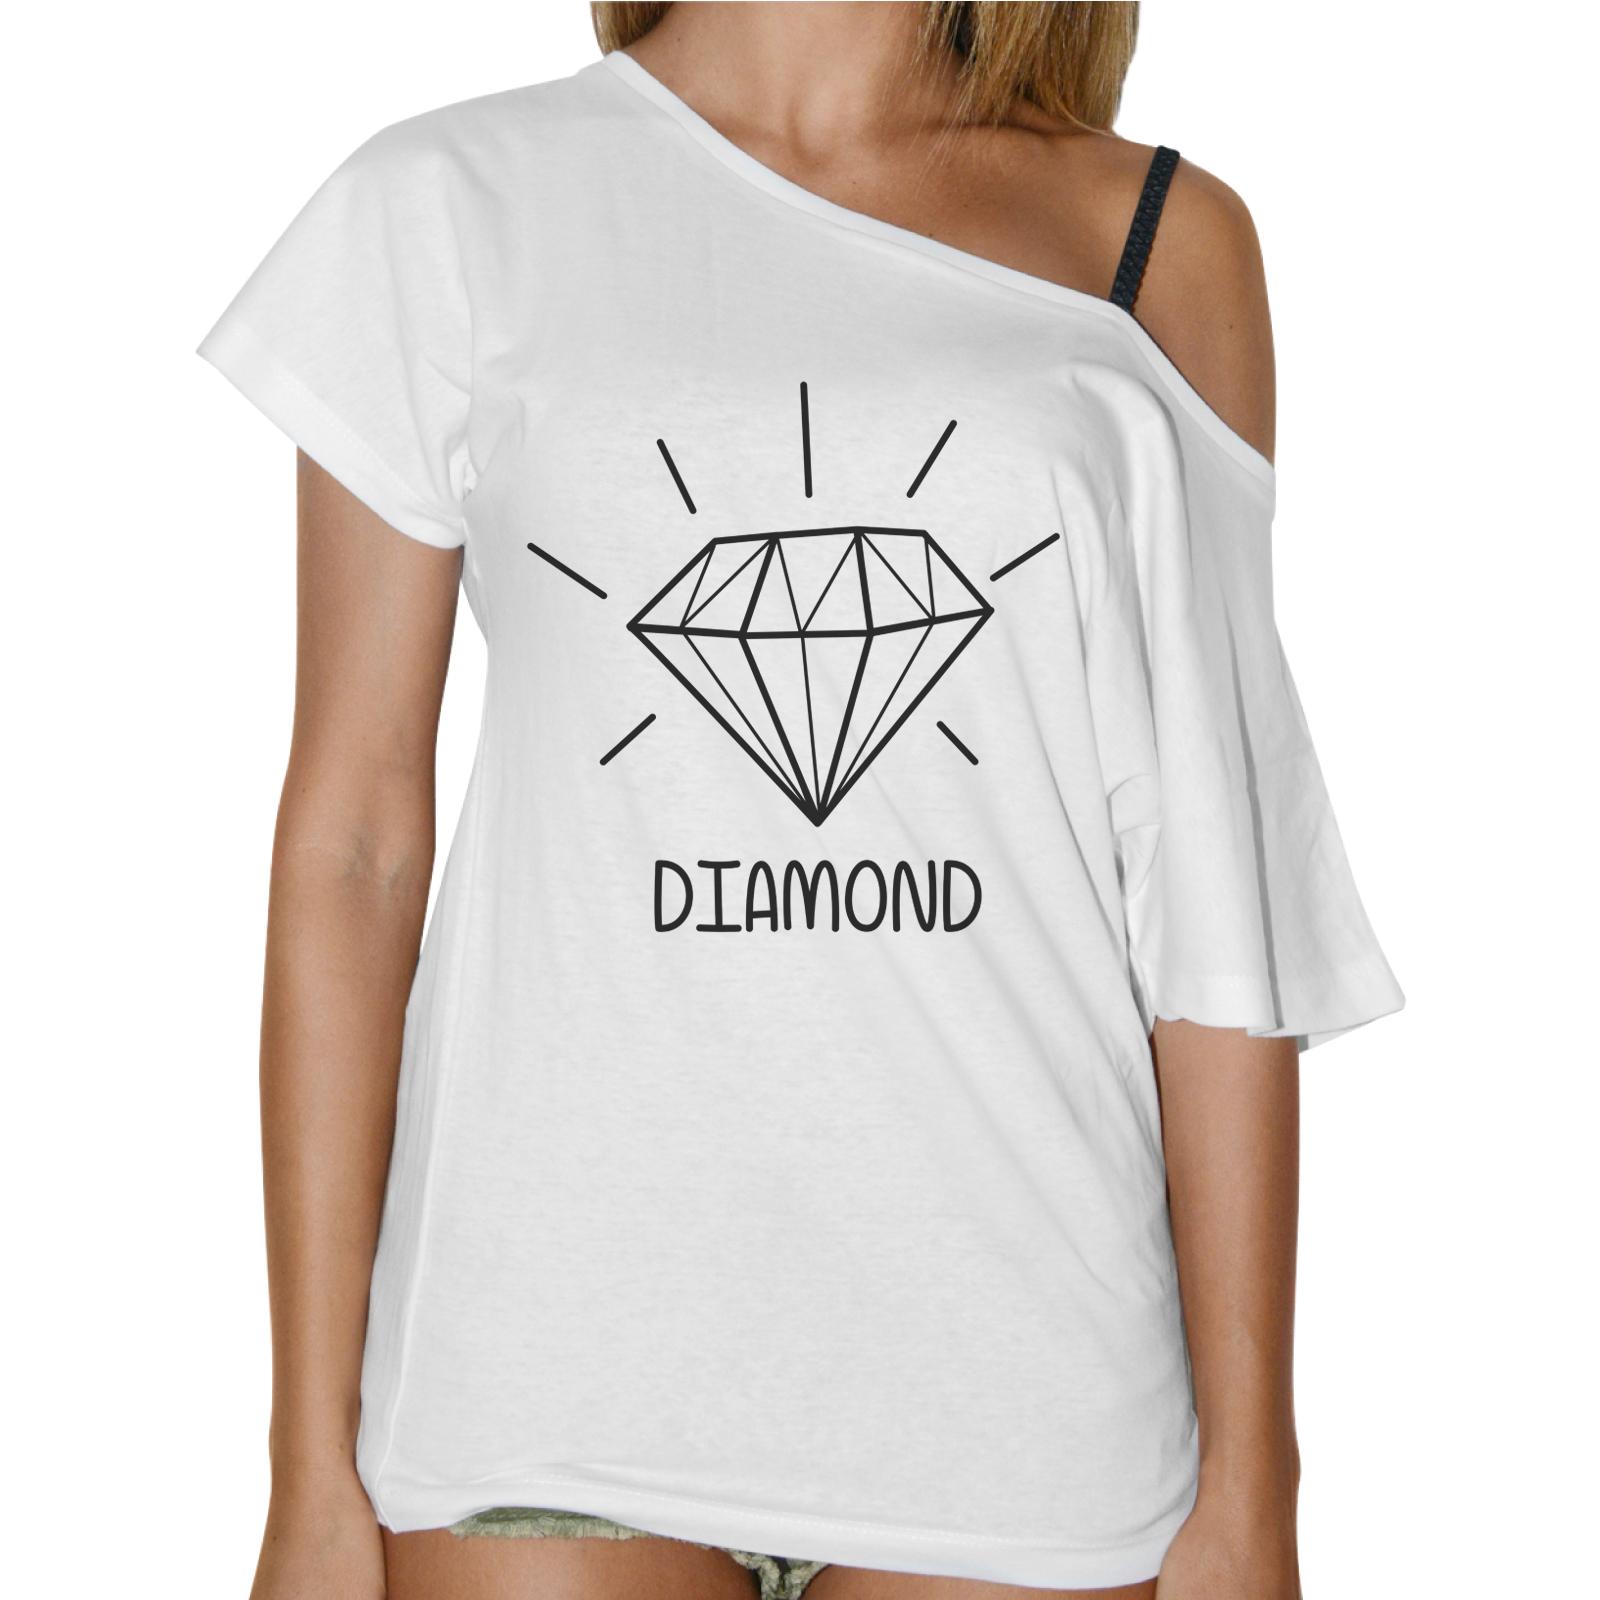 T-Shirt Donna Collo Barca DIAMOND